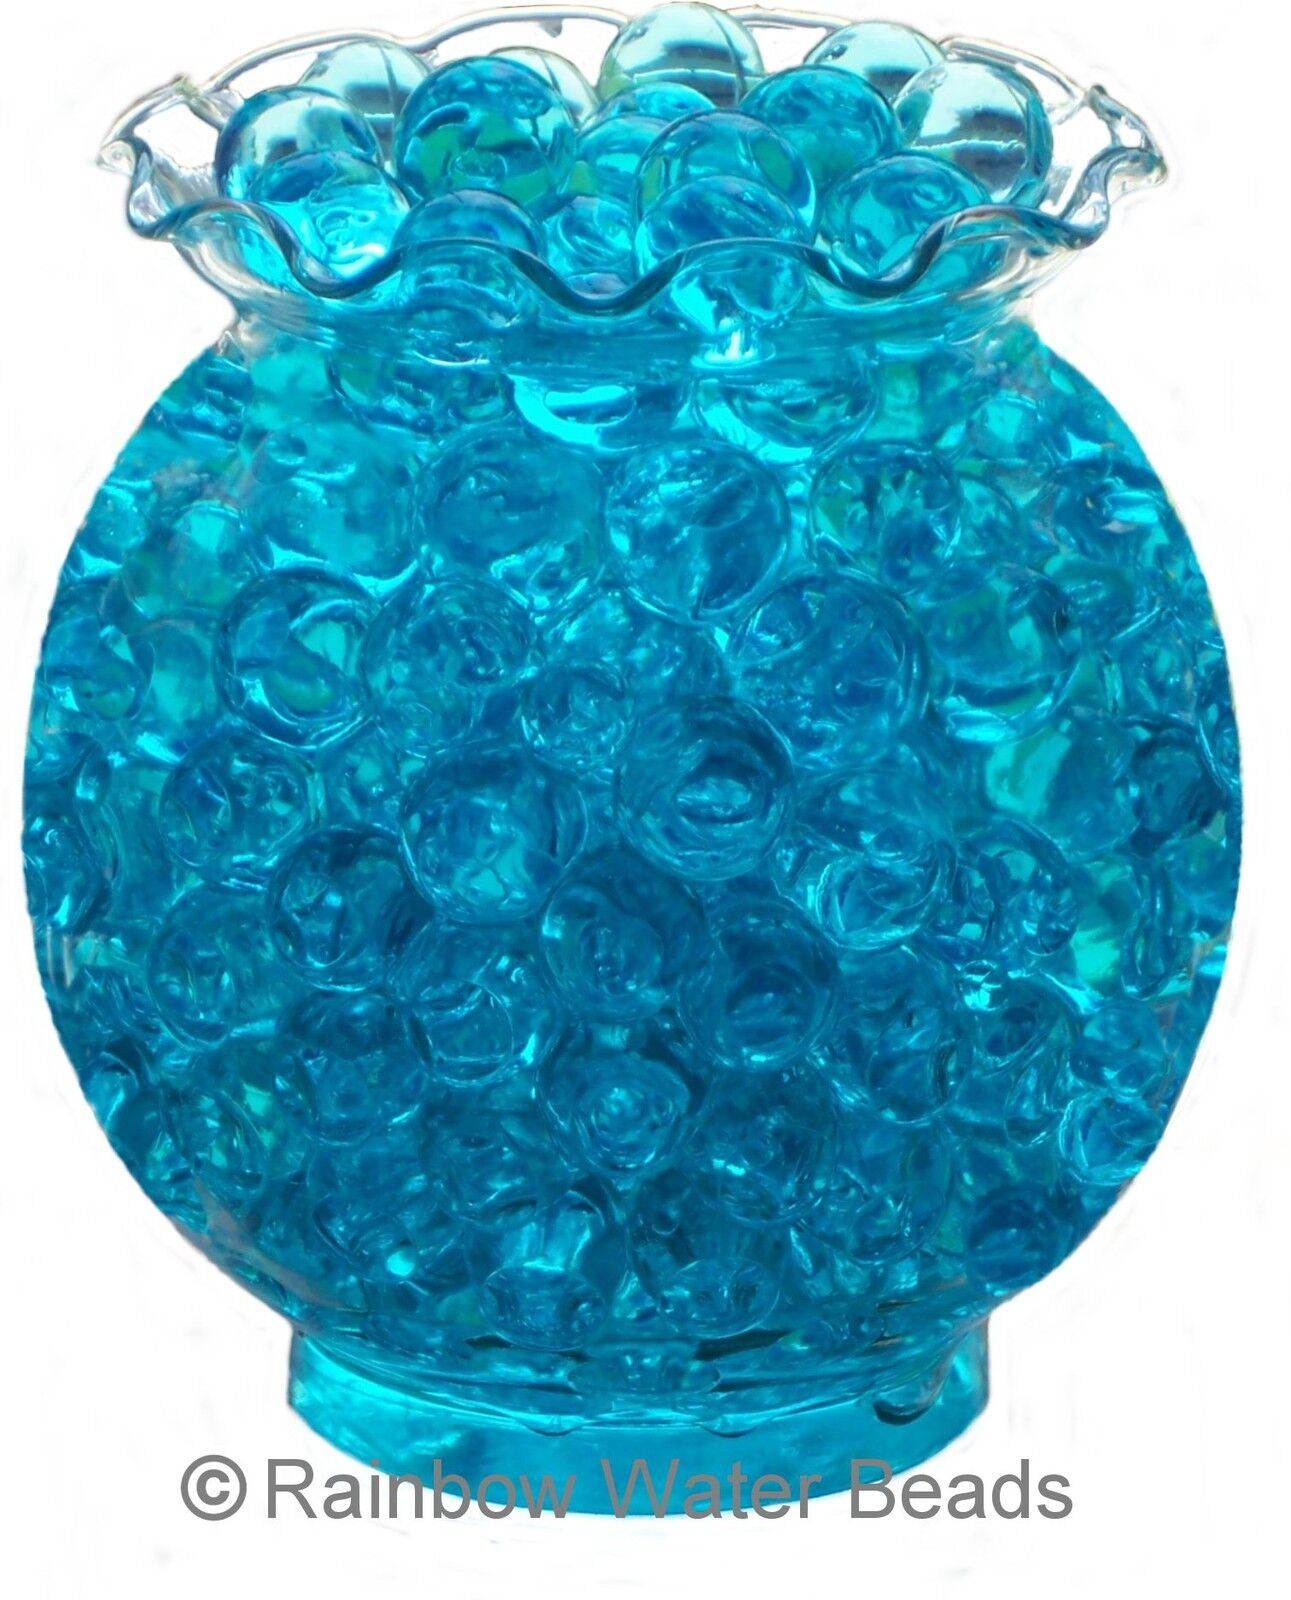 water beads bulk bag makes 8 gallons